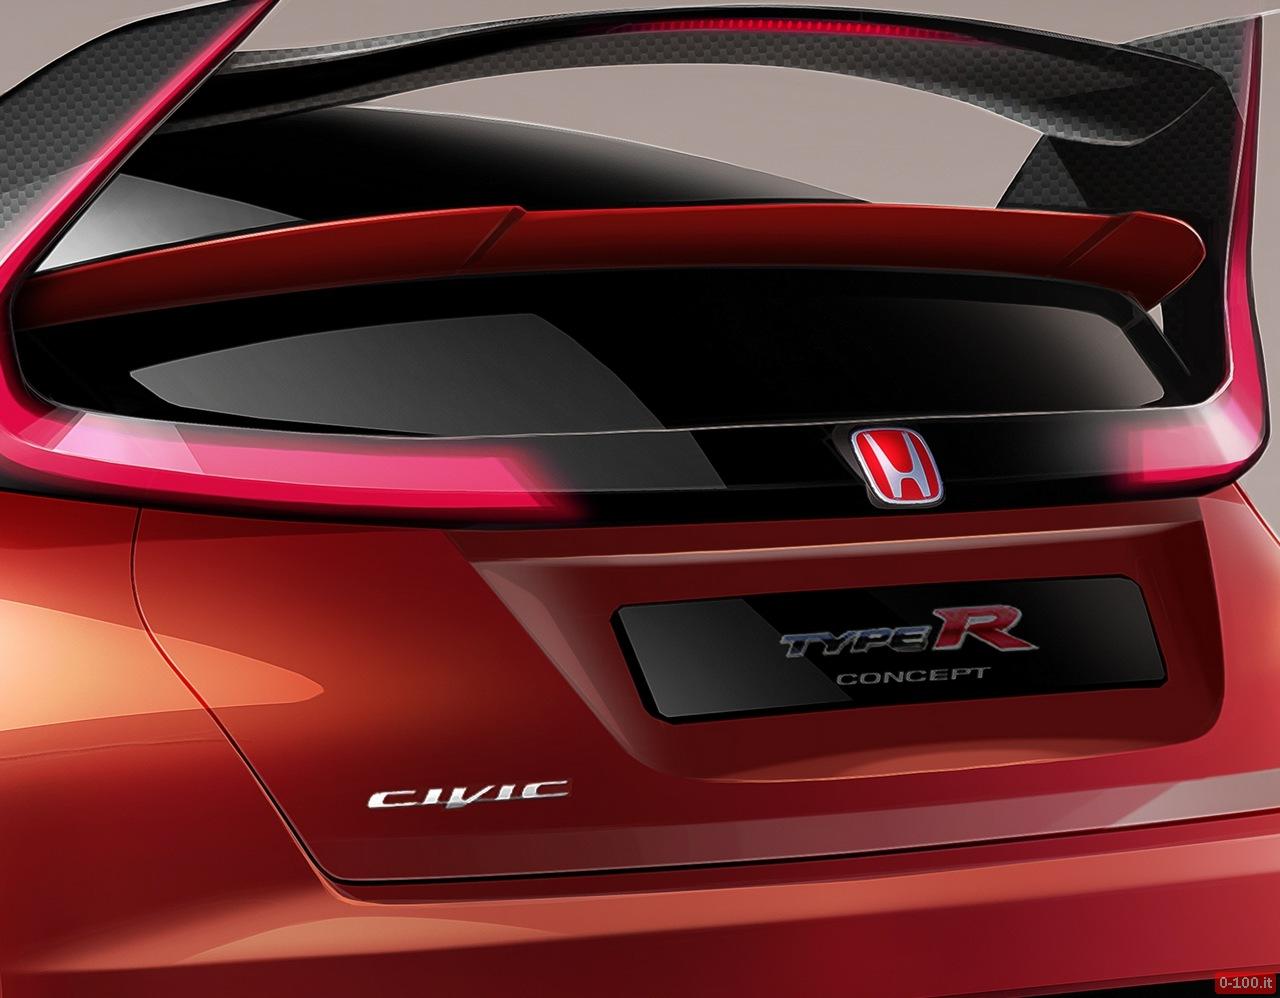 ginevra-2014-honda-civic-type-r-concept-fcev-concept-motore-nsx-2015-0-100_4